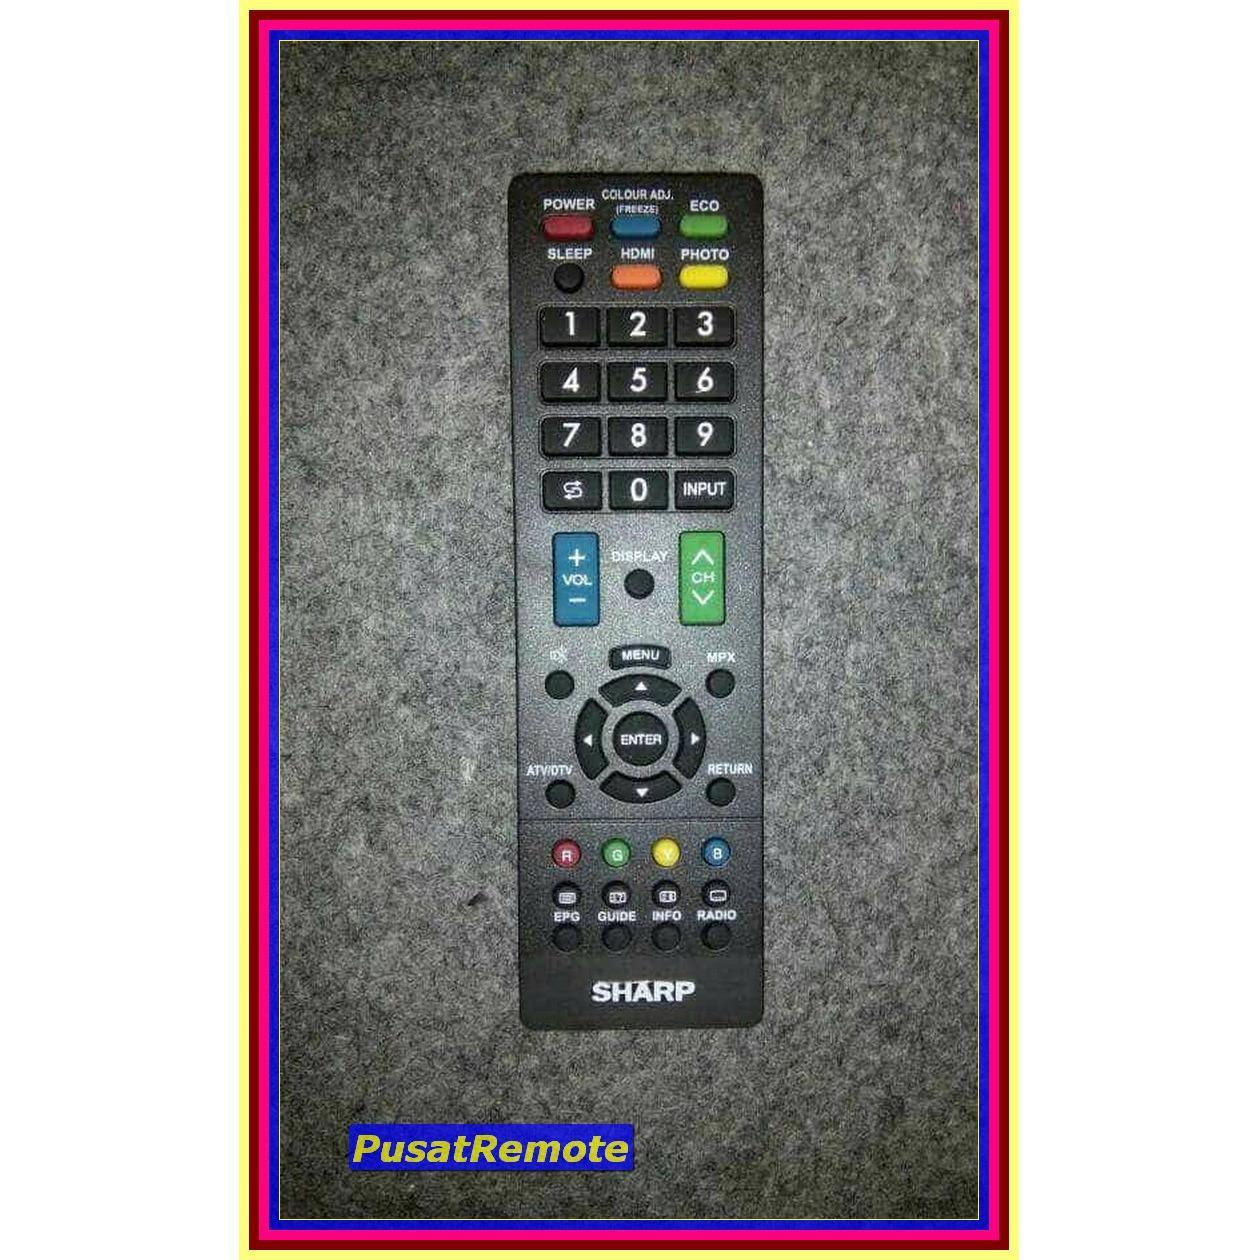 Info Harga Tv Led Sharp Aquos 42 Inch Oktober 2018 Terlengkap 24 Lc24le175i Remote Lcd Plasma